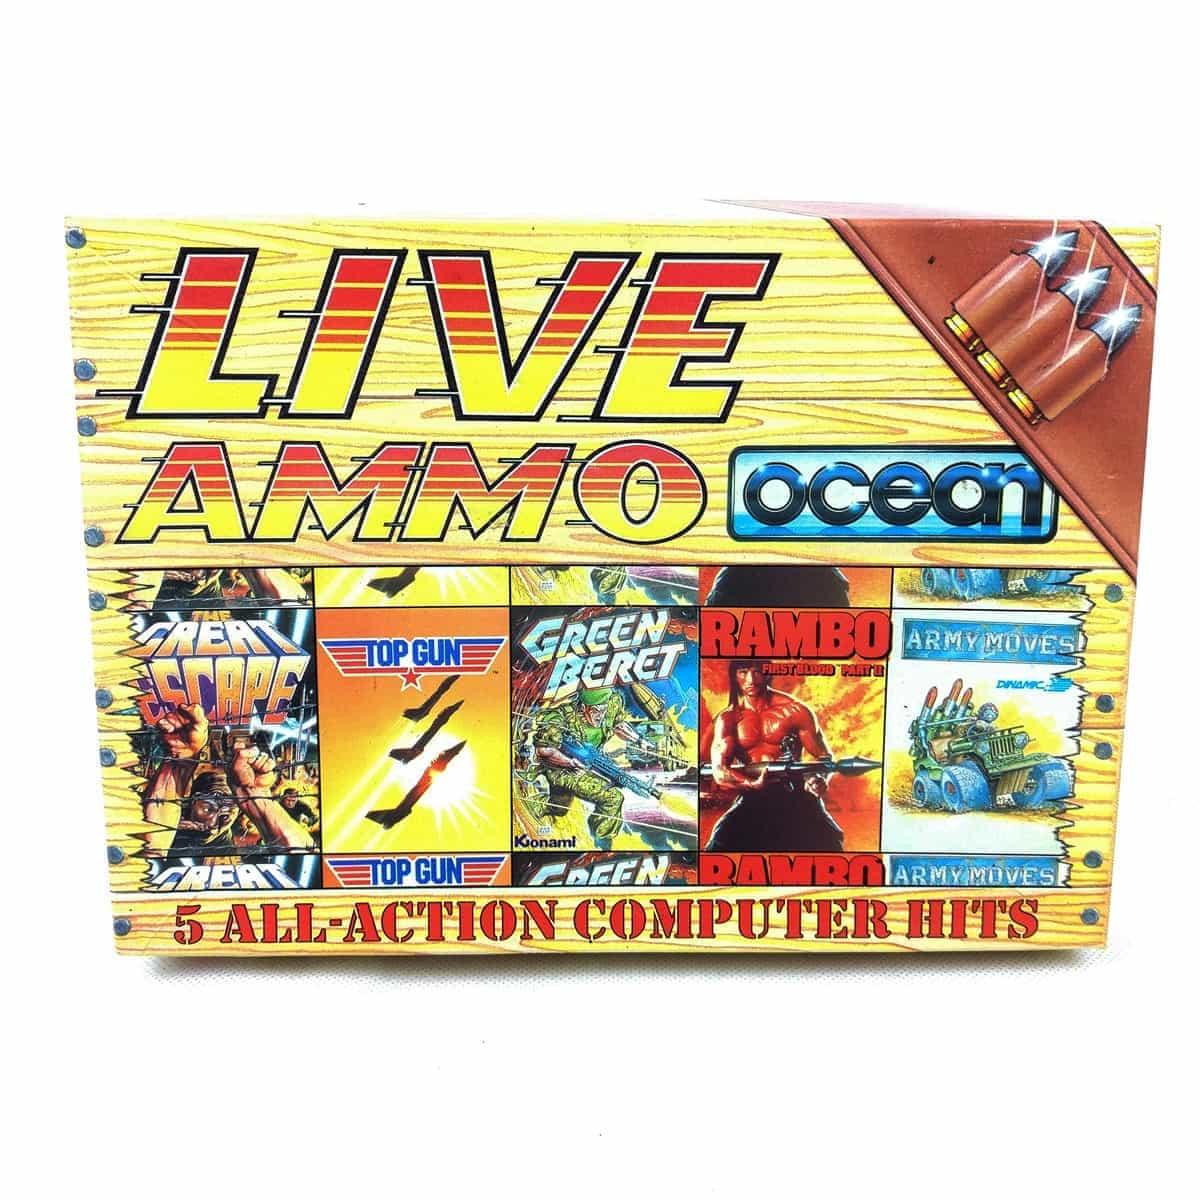 Live Ammo (C64 Cassette) bånd mangler